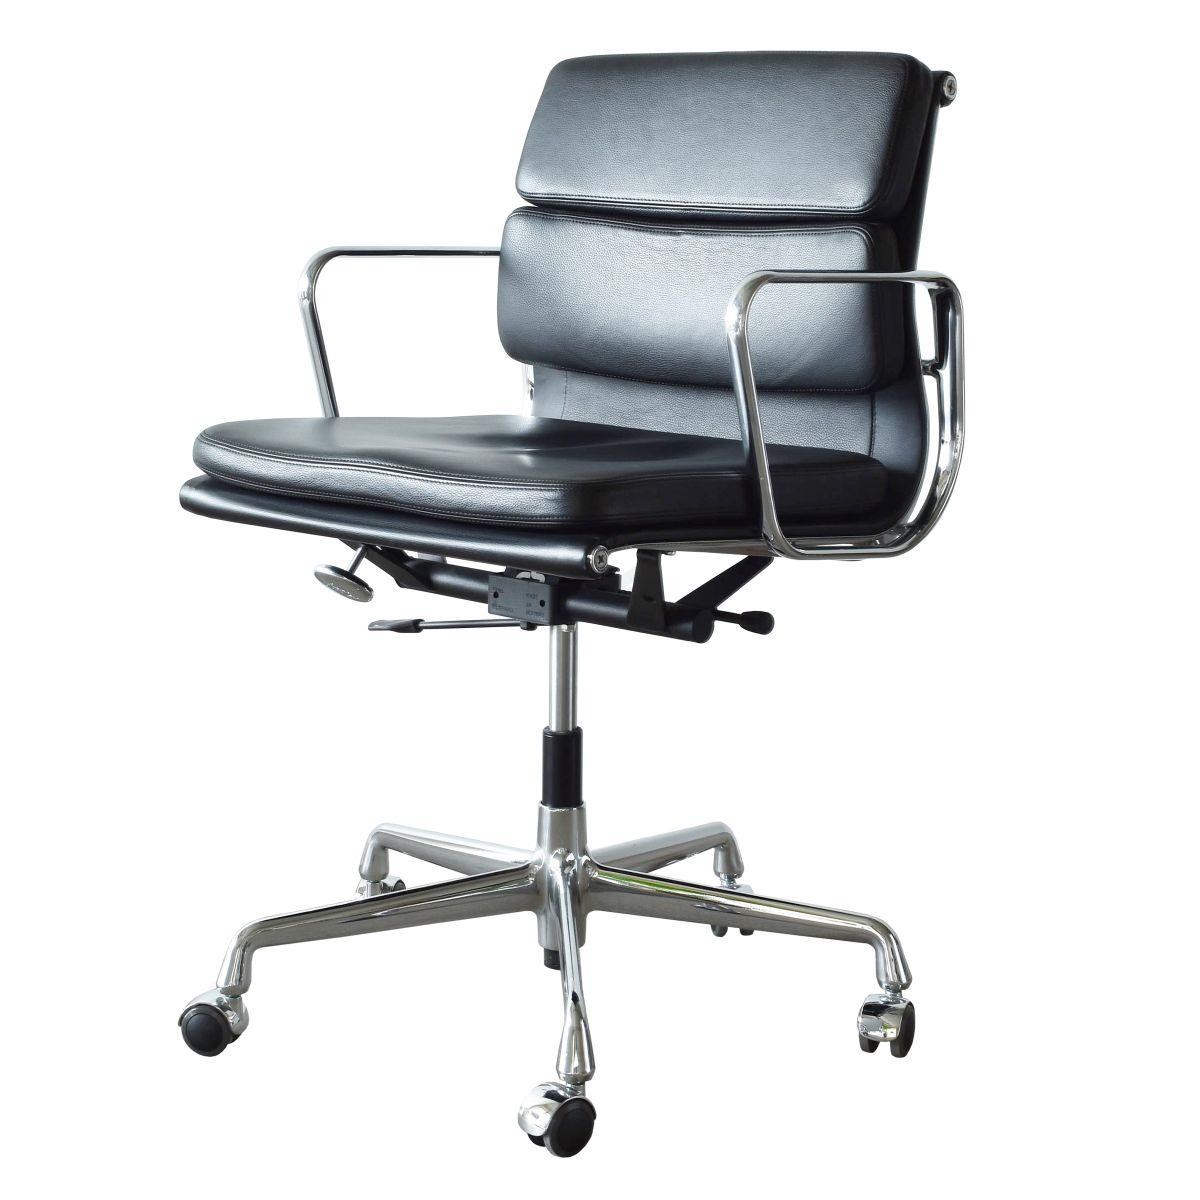 ea217 soft pad management stuhl von charles und ray eames f r vitra bei pamono kaufen. Black Bedroom Furniture Sets. Home Design Ideas